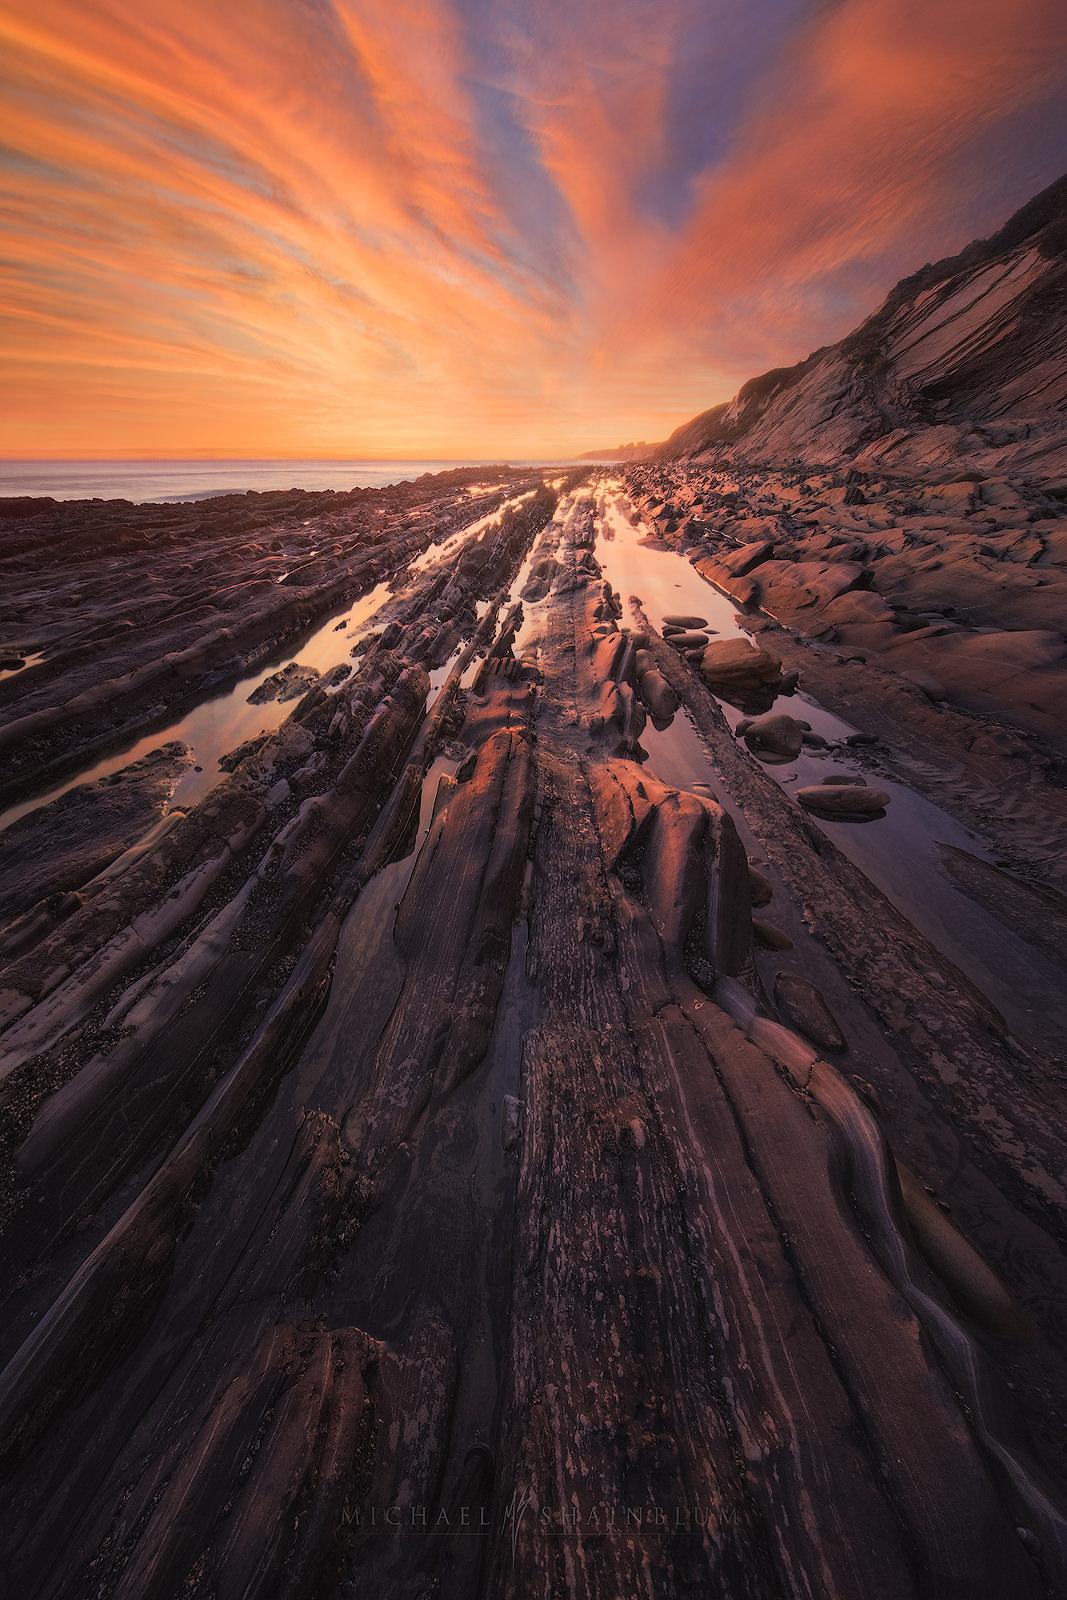 Santa Barbara Seascape, Coastal Landscape Photography.